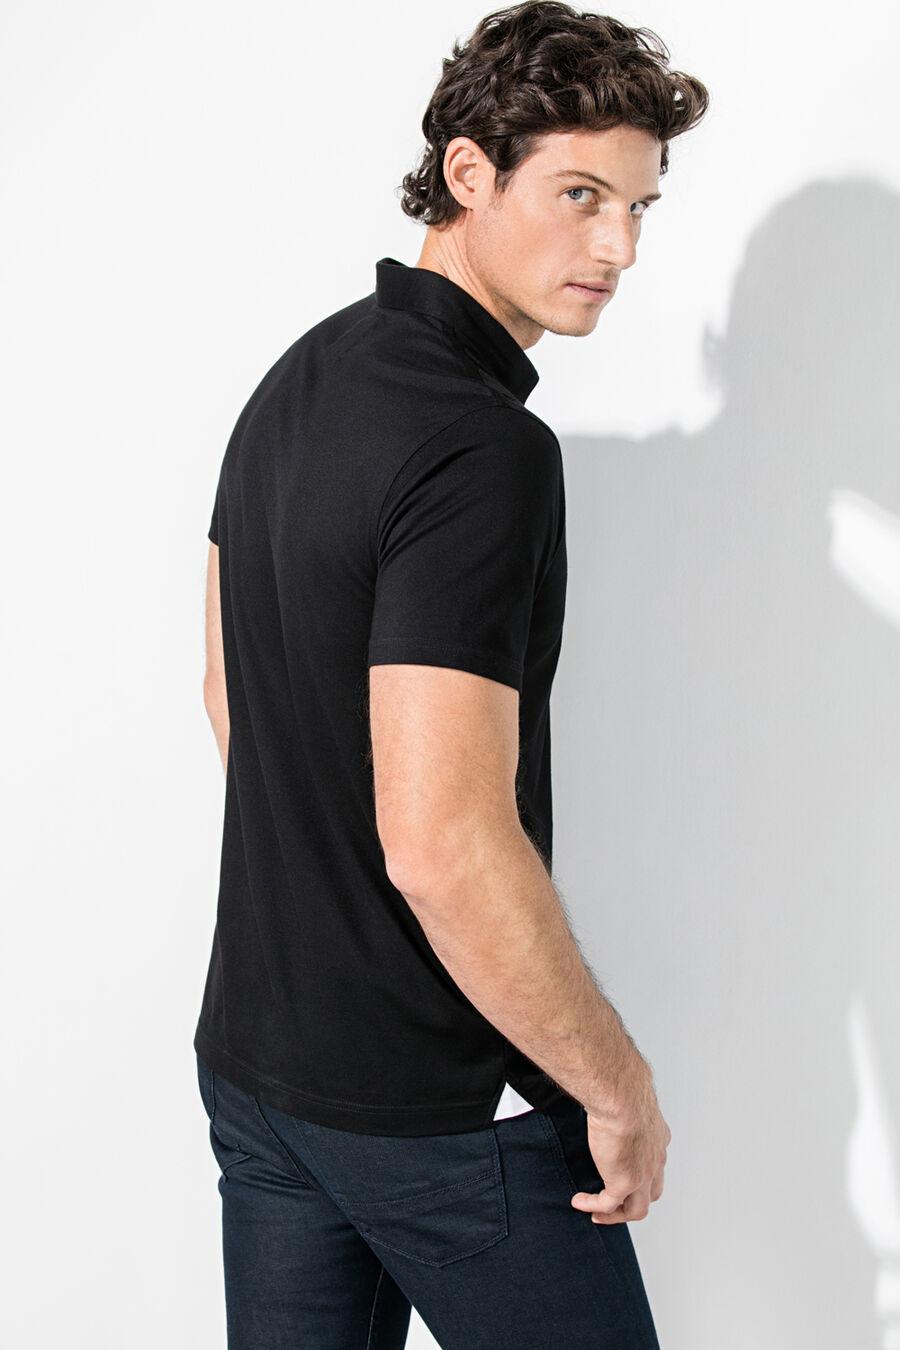 PdH polo shirt